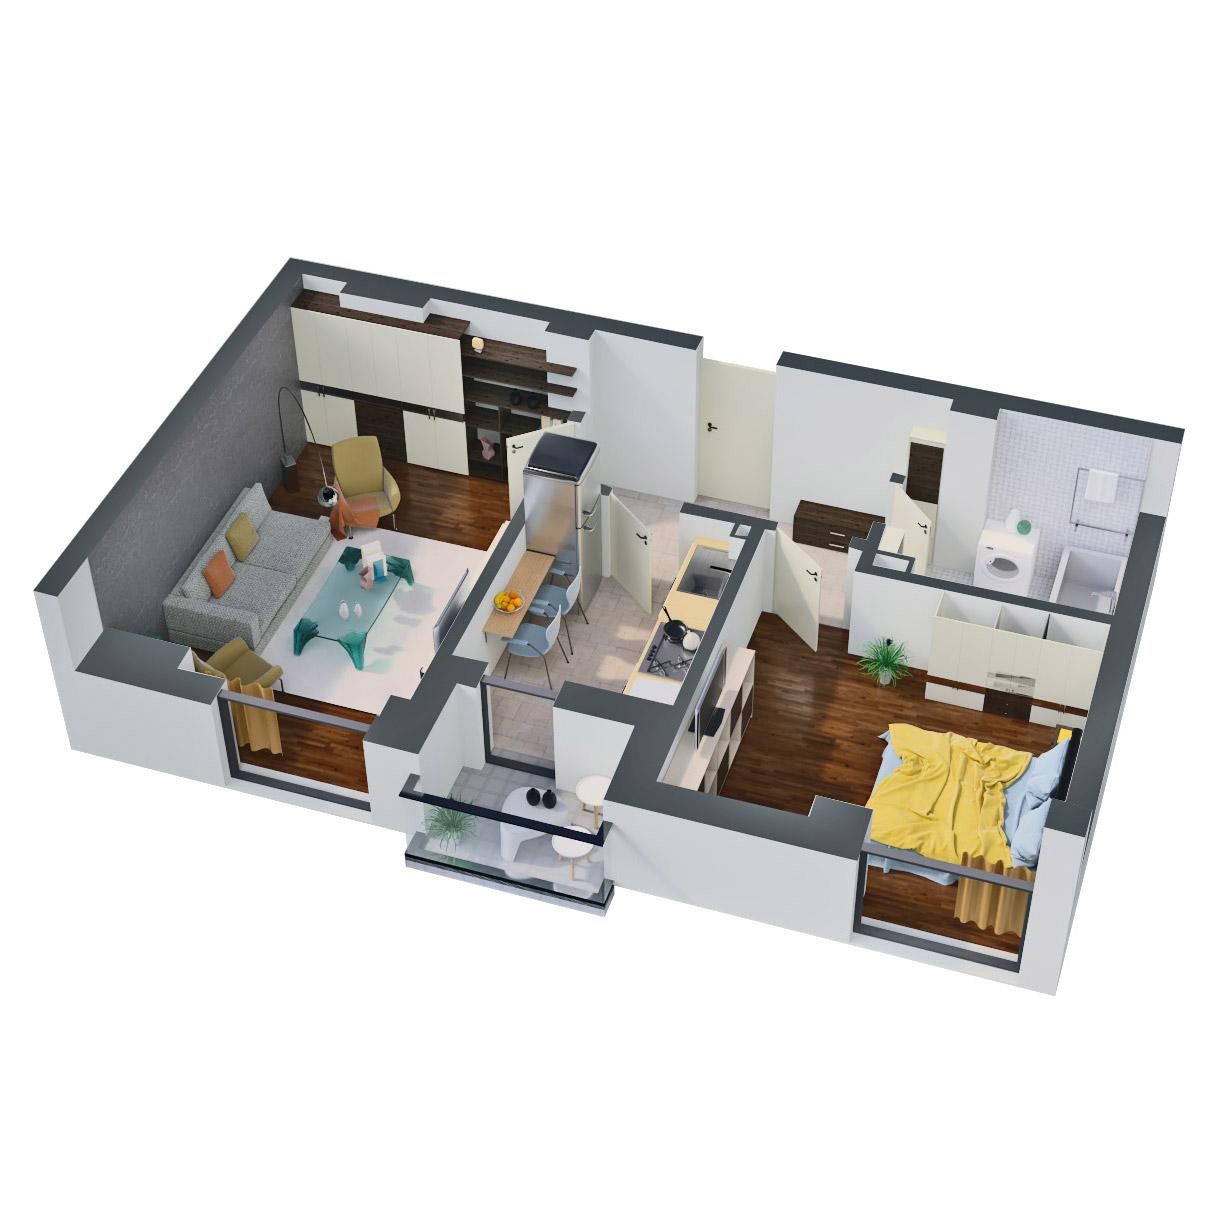 Apartament 2 camere de vanzare Bucuresti - Catedral Residence - Marriott, Piata Unirii, 13 Septembrie, Izvor - Tip 1 - T2A - C